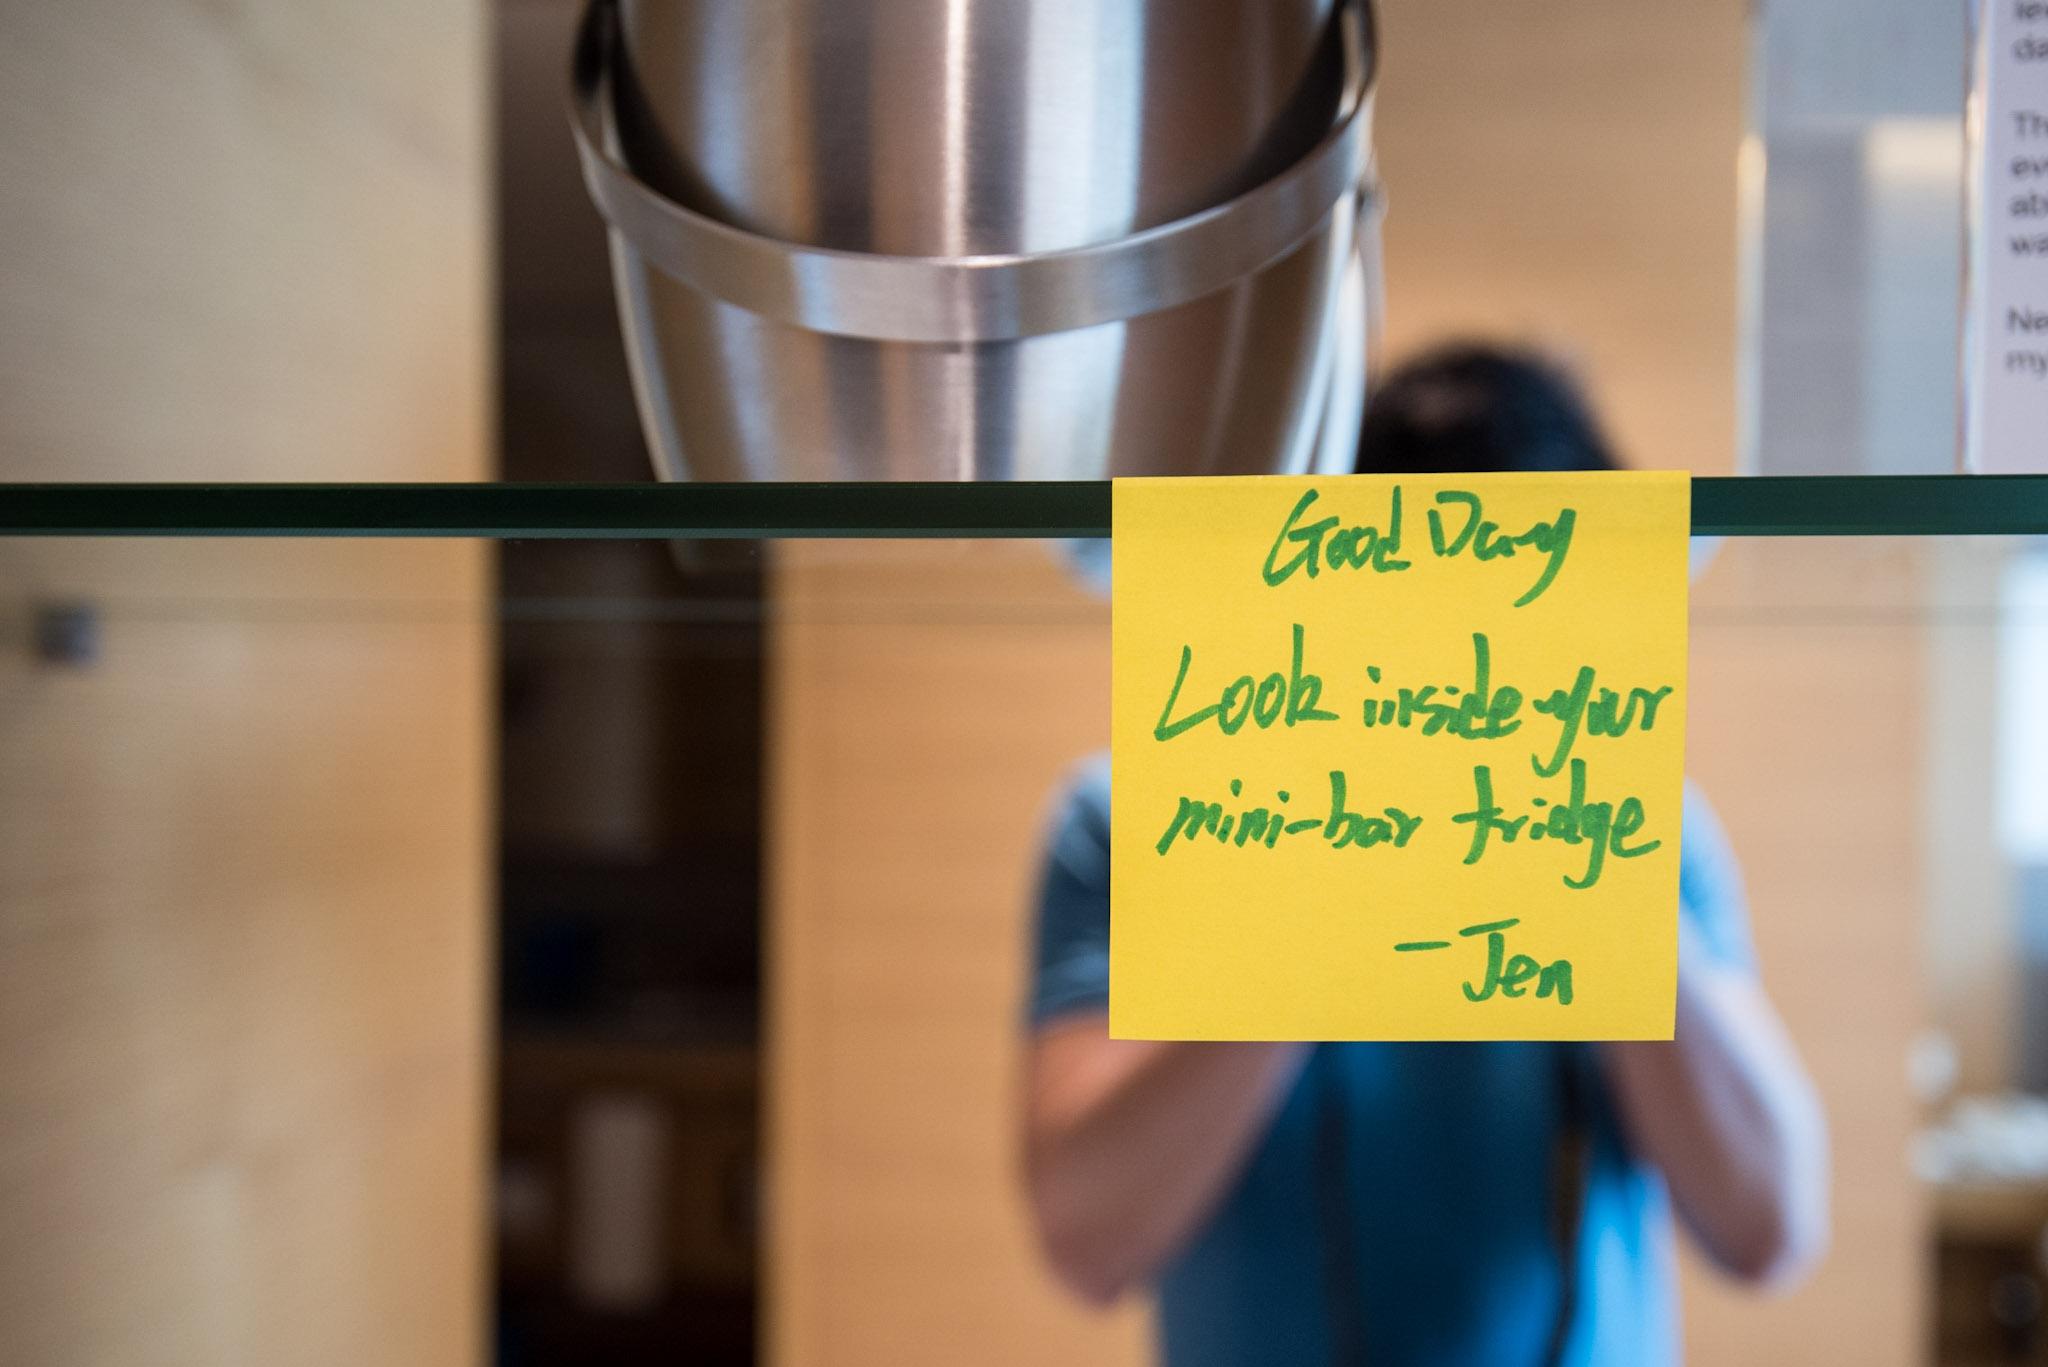 A Note from Jen - Hotel Jen Orchardgateway Singapore